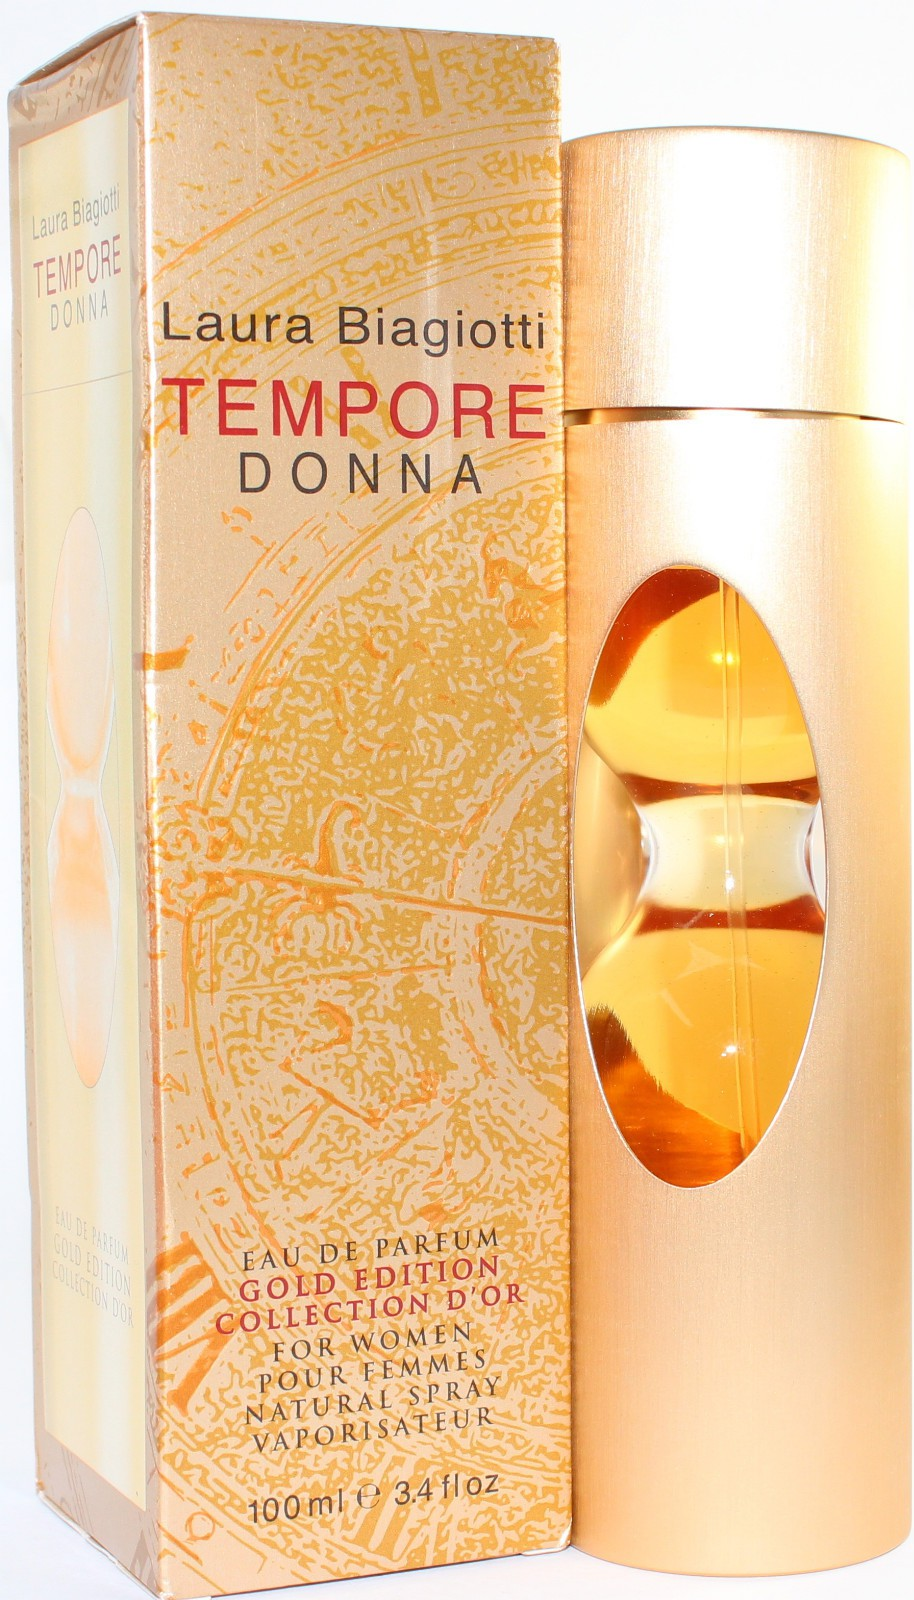 Laura Biagiotti Tempore Donna аромат для женщин